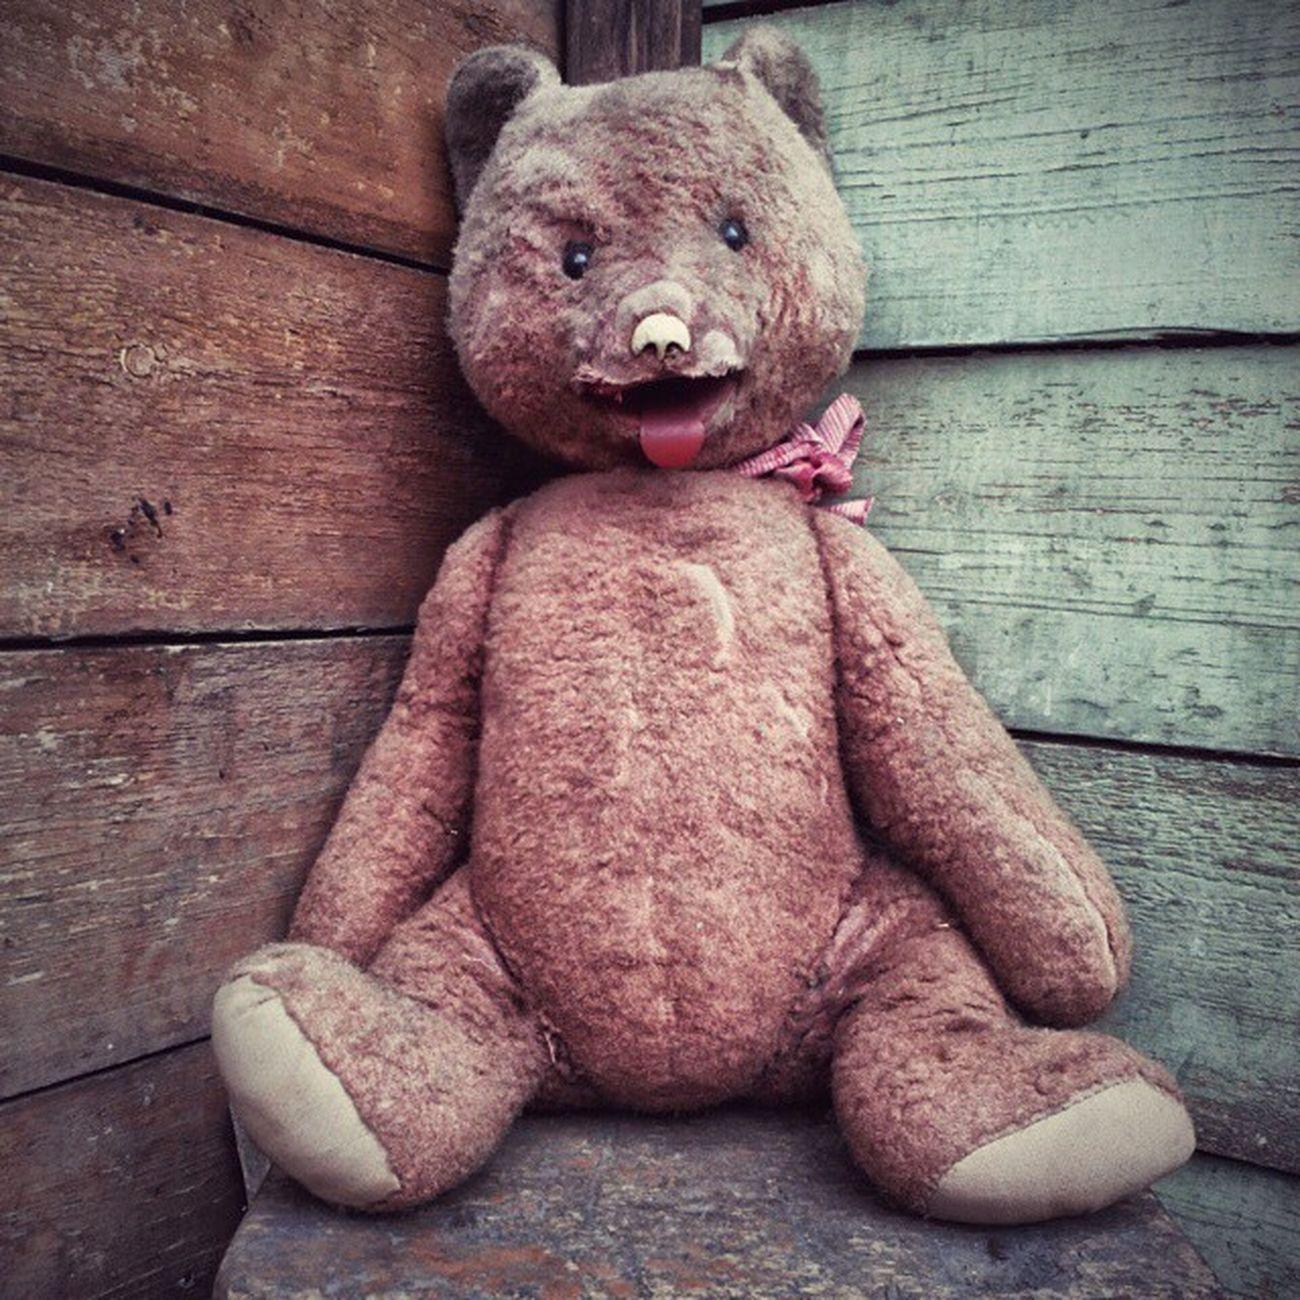 омск сибирь старыйдом старый медведь фактура доска Omsk Siberia Oldhouse Oldbear Teddybear Facture Plank Instaomsk15